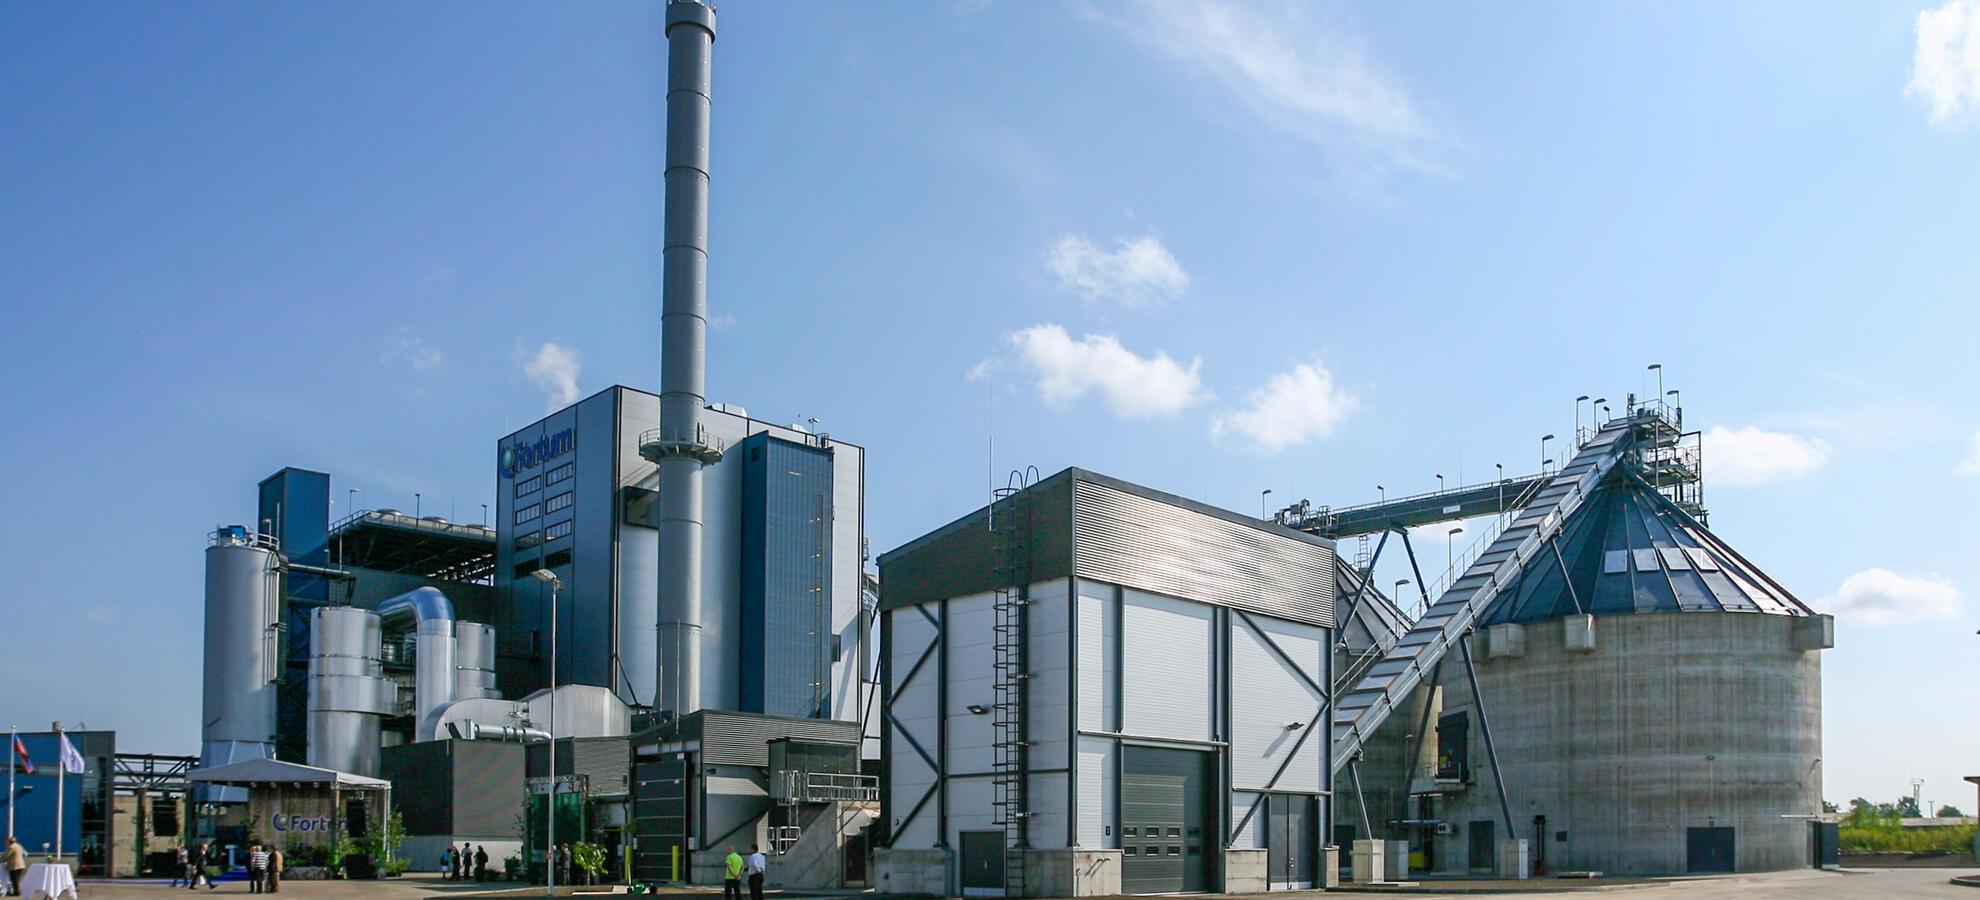 Jelgava - power plant in Latvia   Fortum